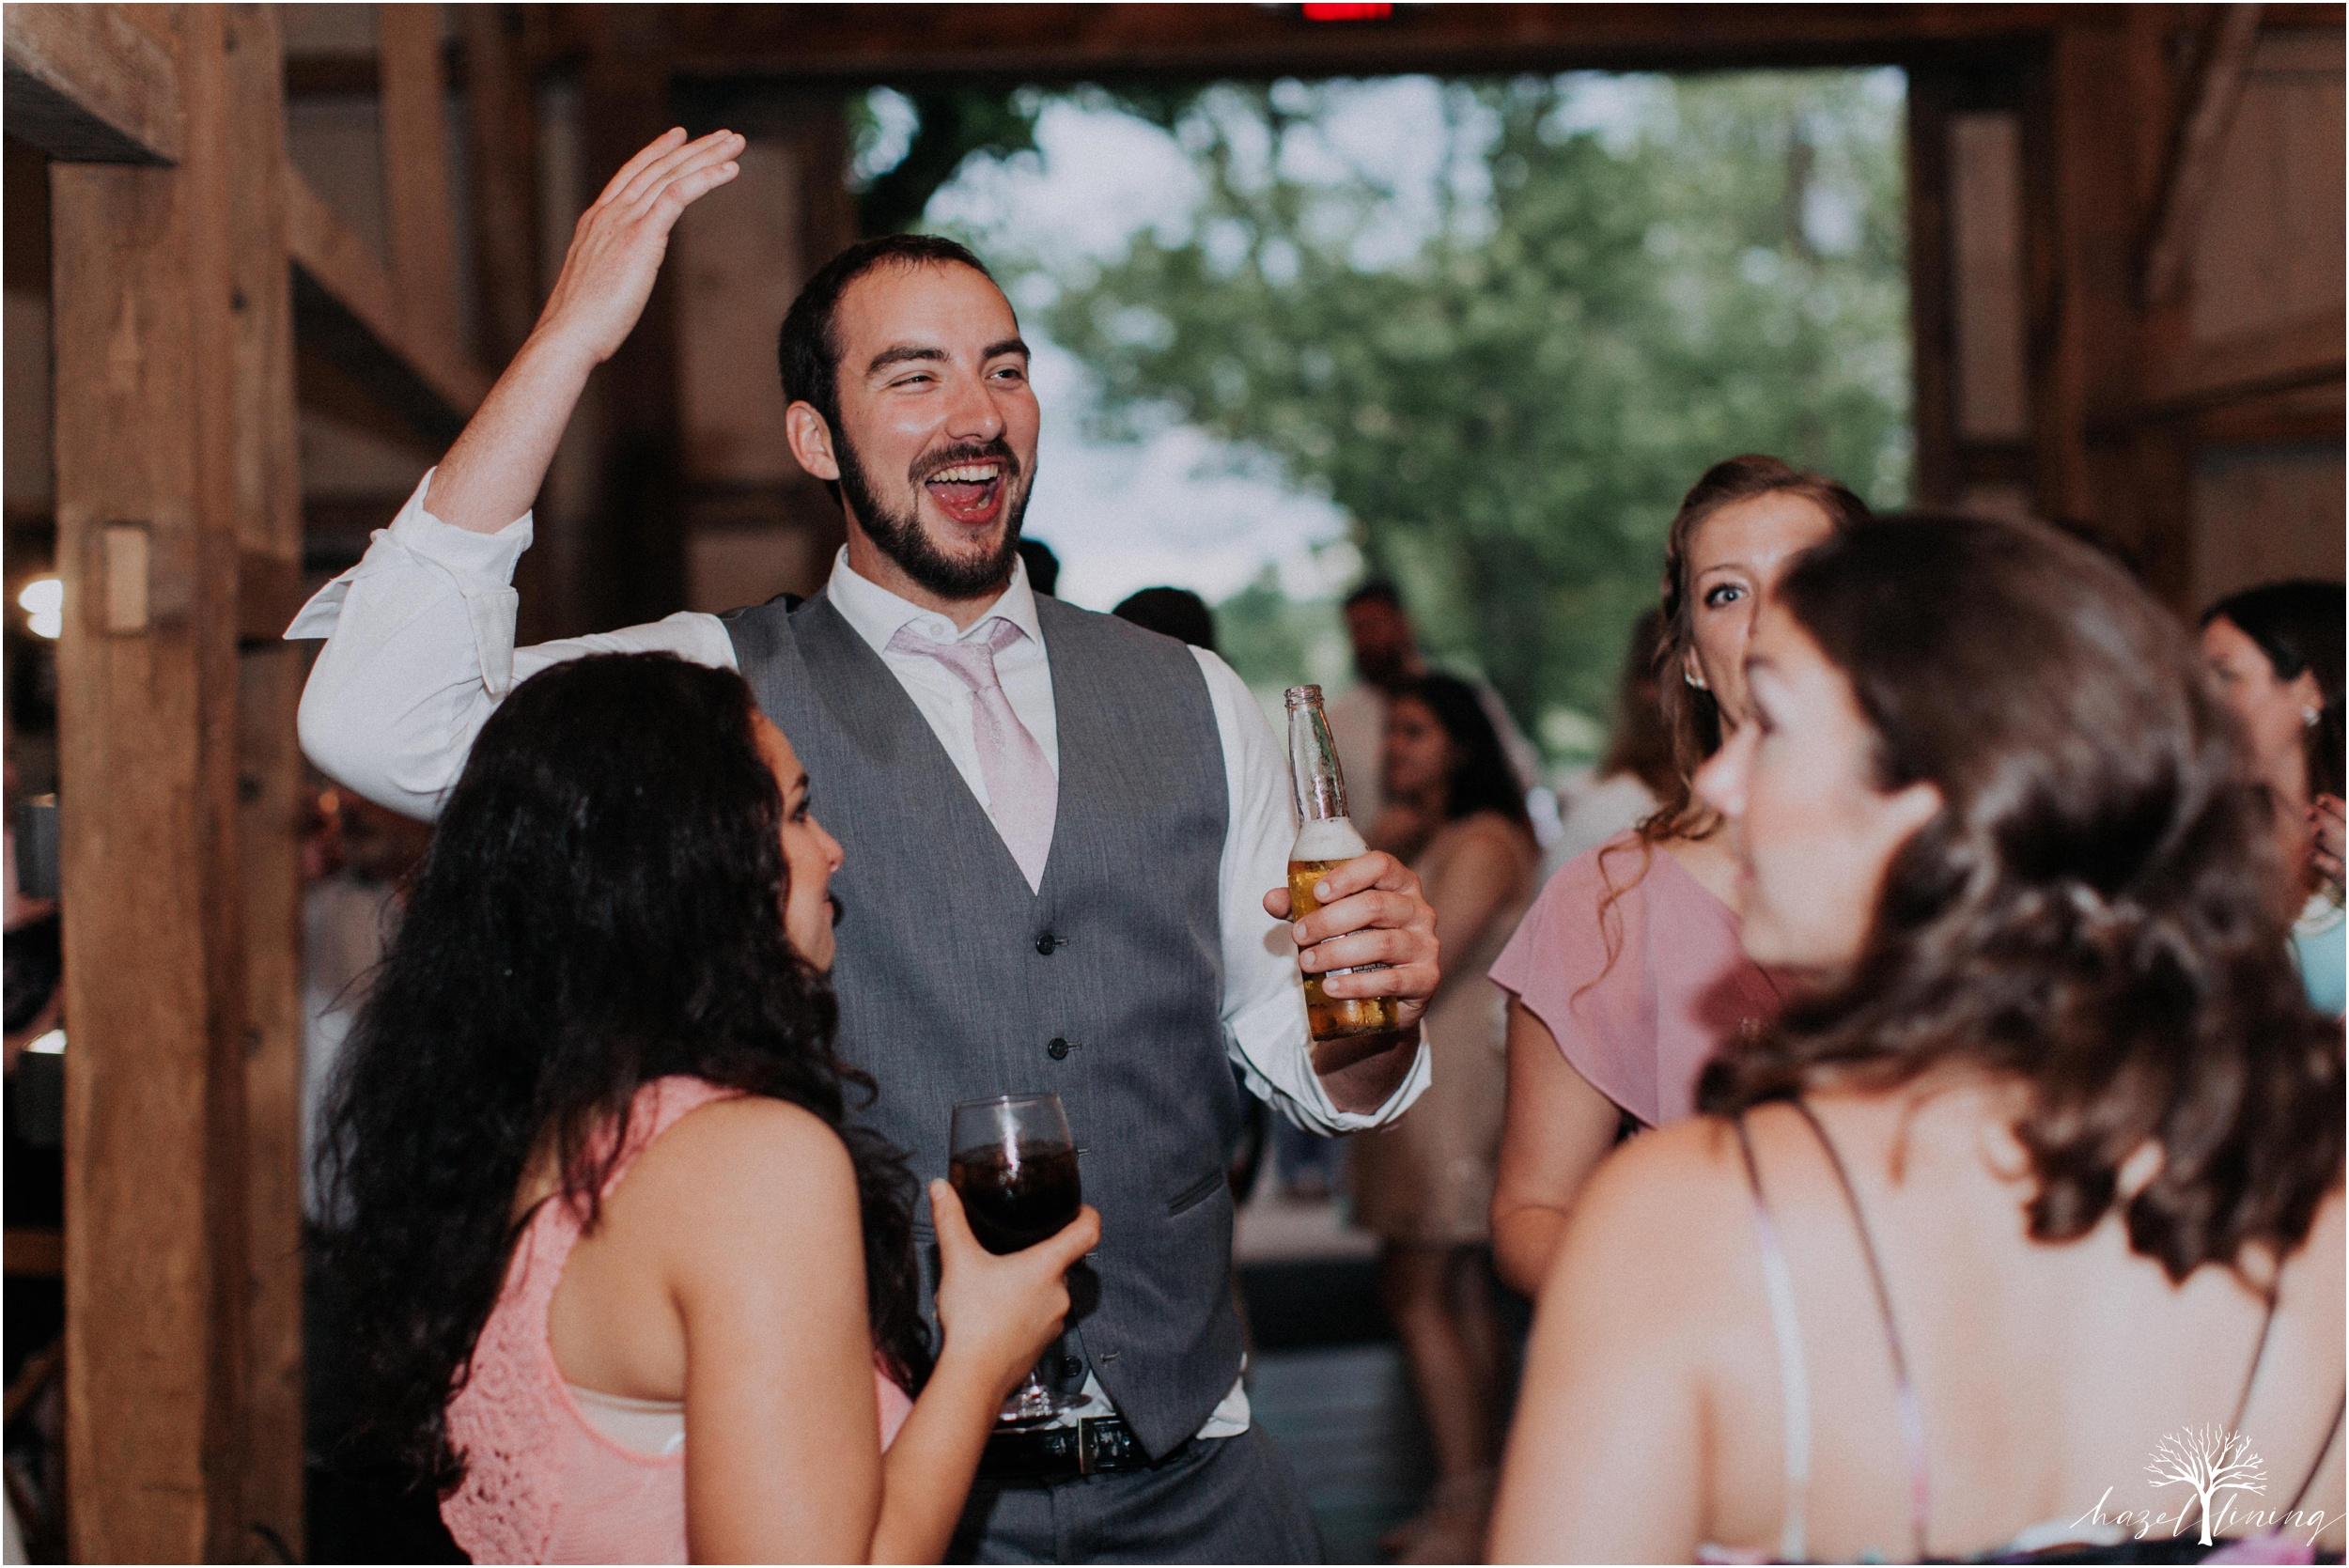 hazel-lining-travel-wedding-elopement-photography-lisa-landon-shoemaker-the-farm-bakery-and-events-bucks-county-quakertown-pennsylvania-summer-country-outdoor-farm-wedding_0159.jpg